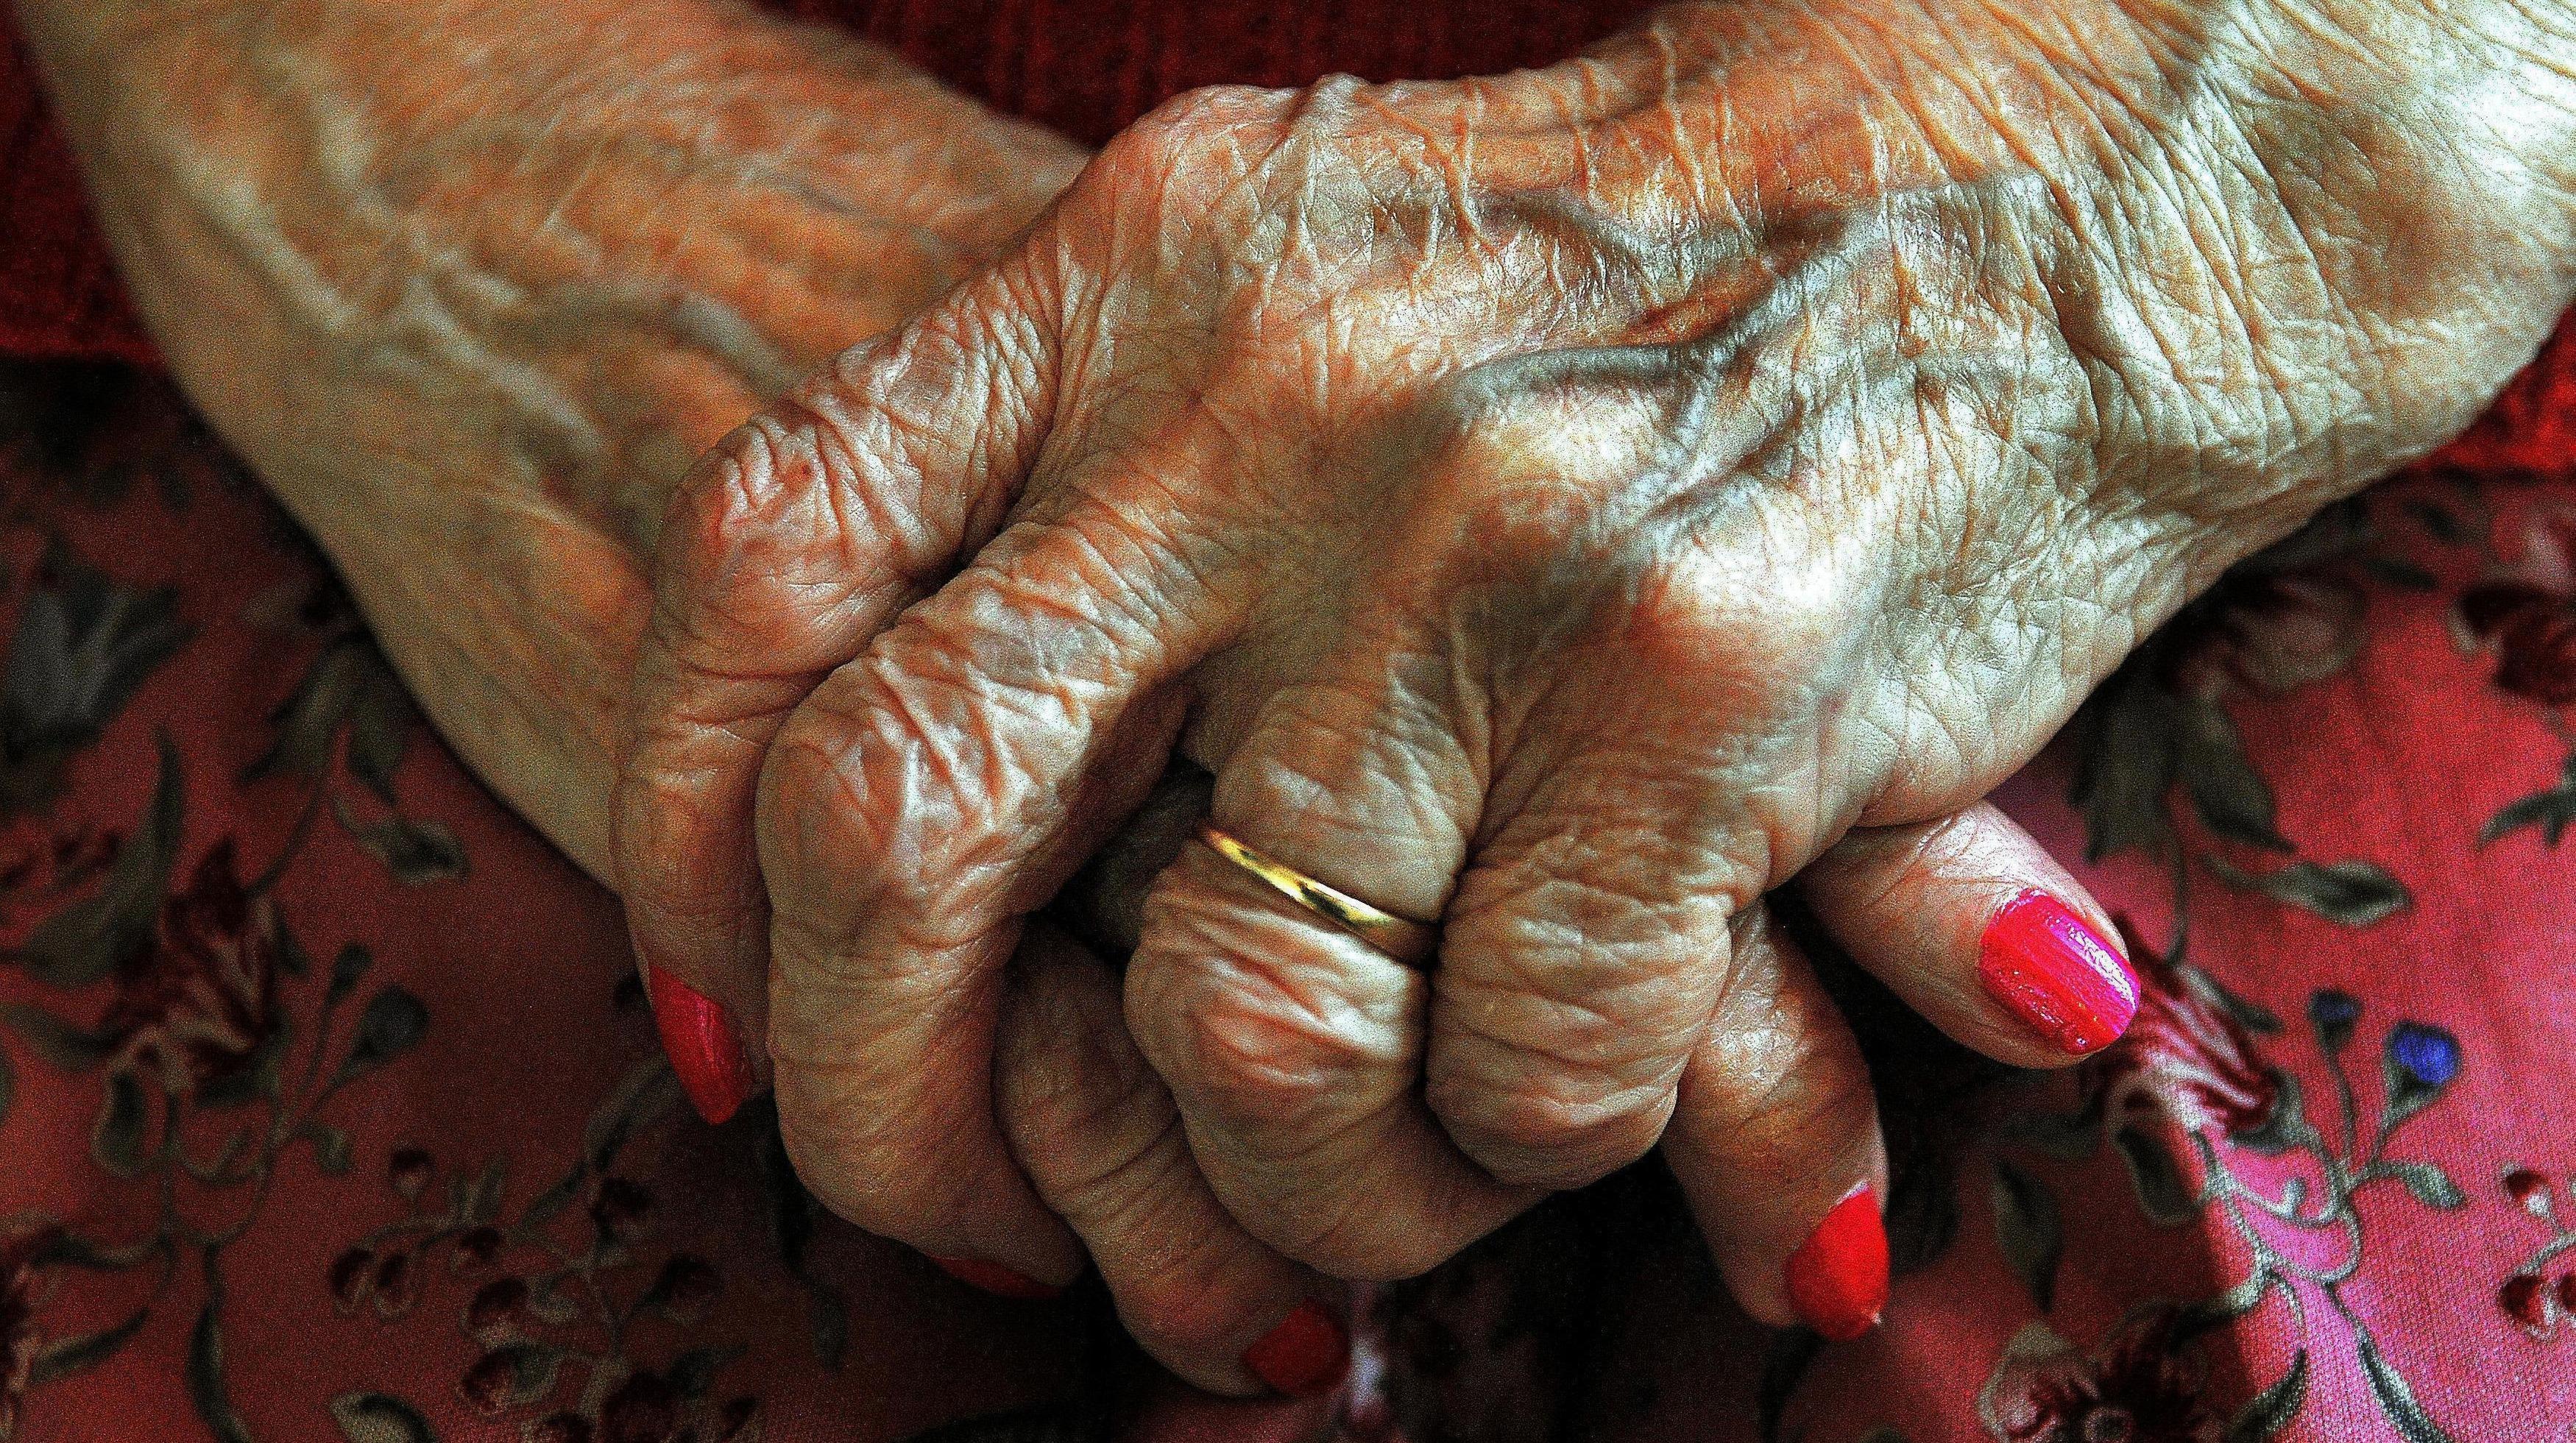 Finger food to improve dementia patients' independence